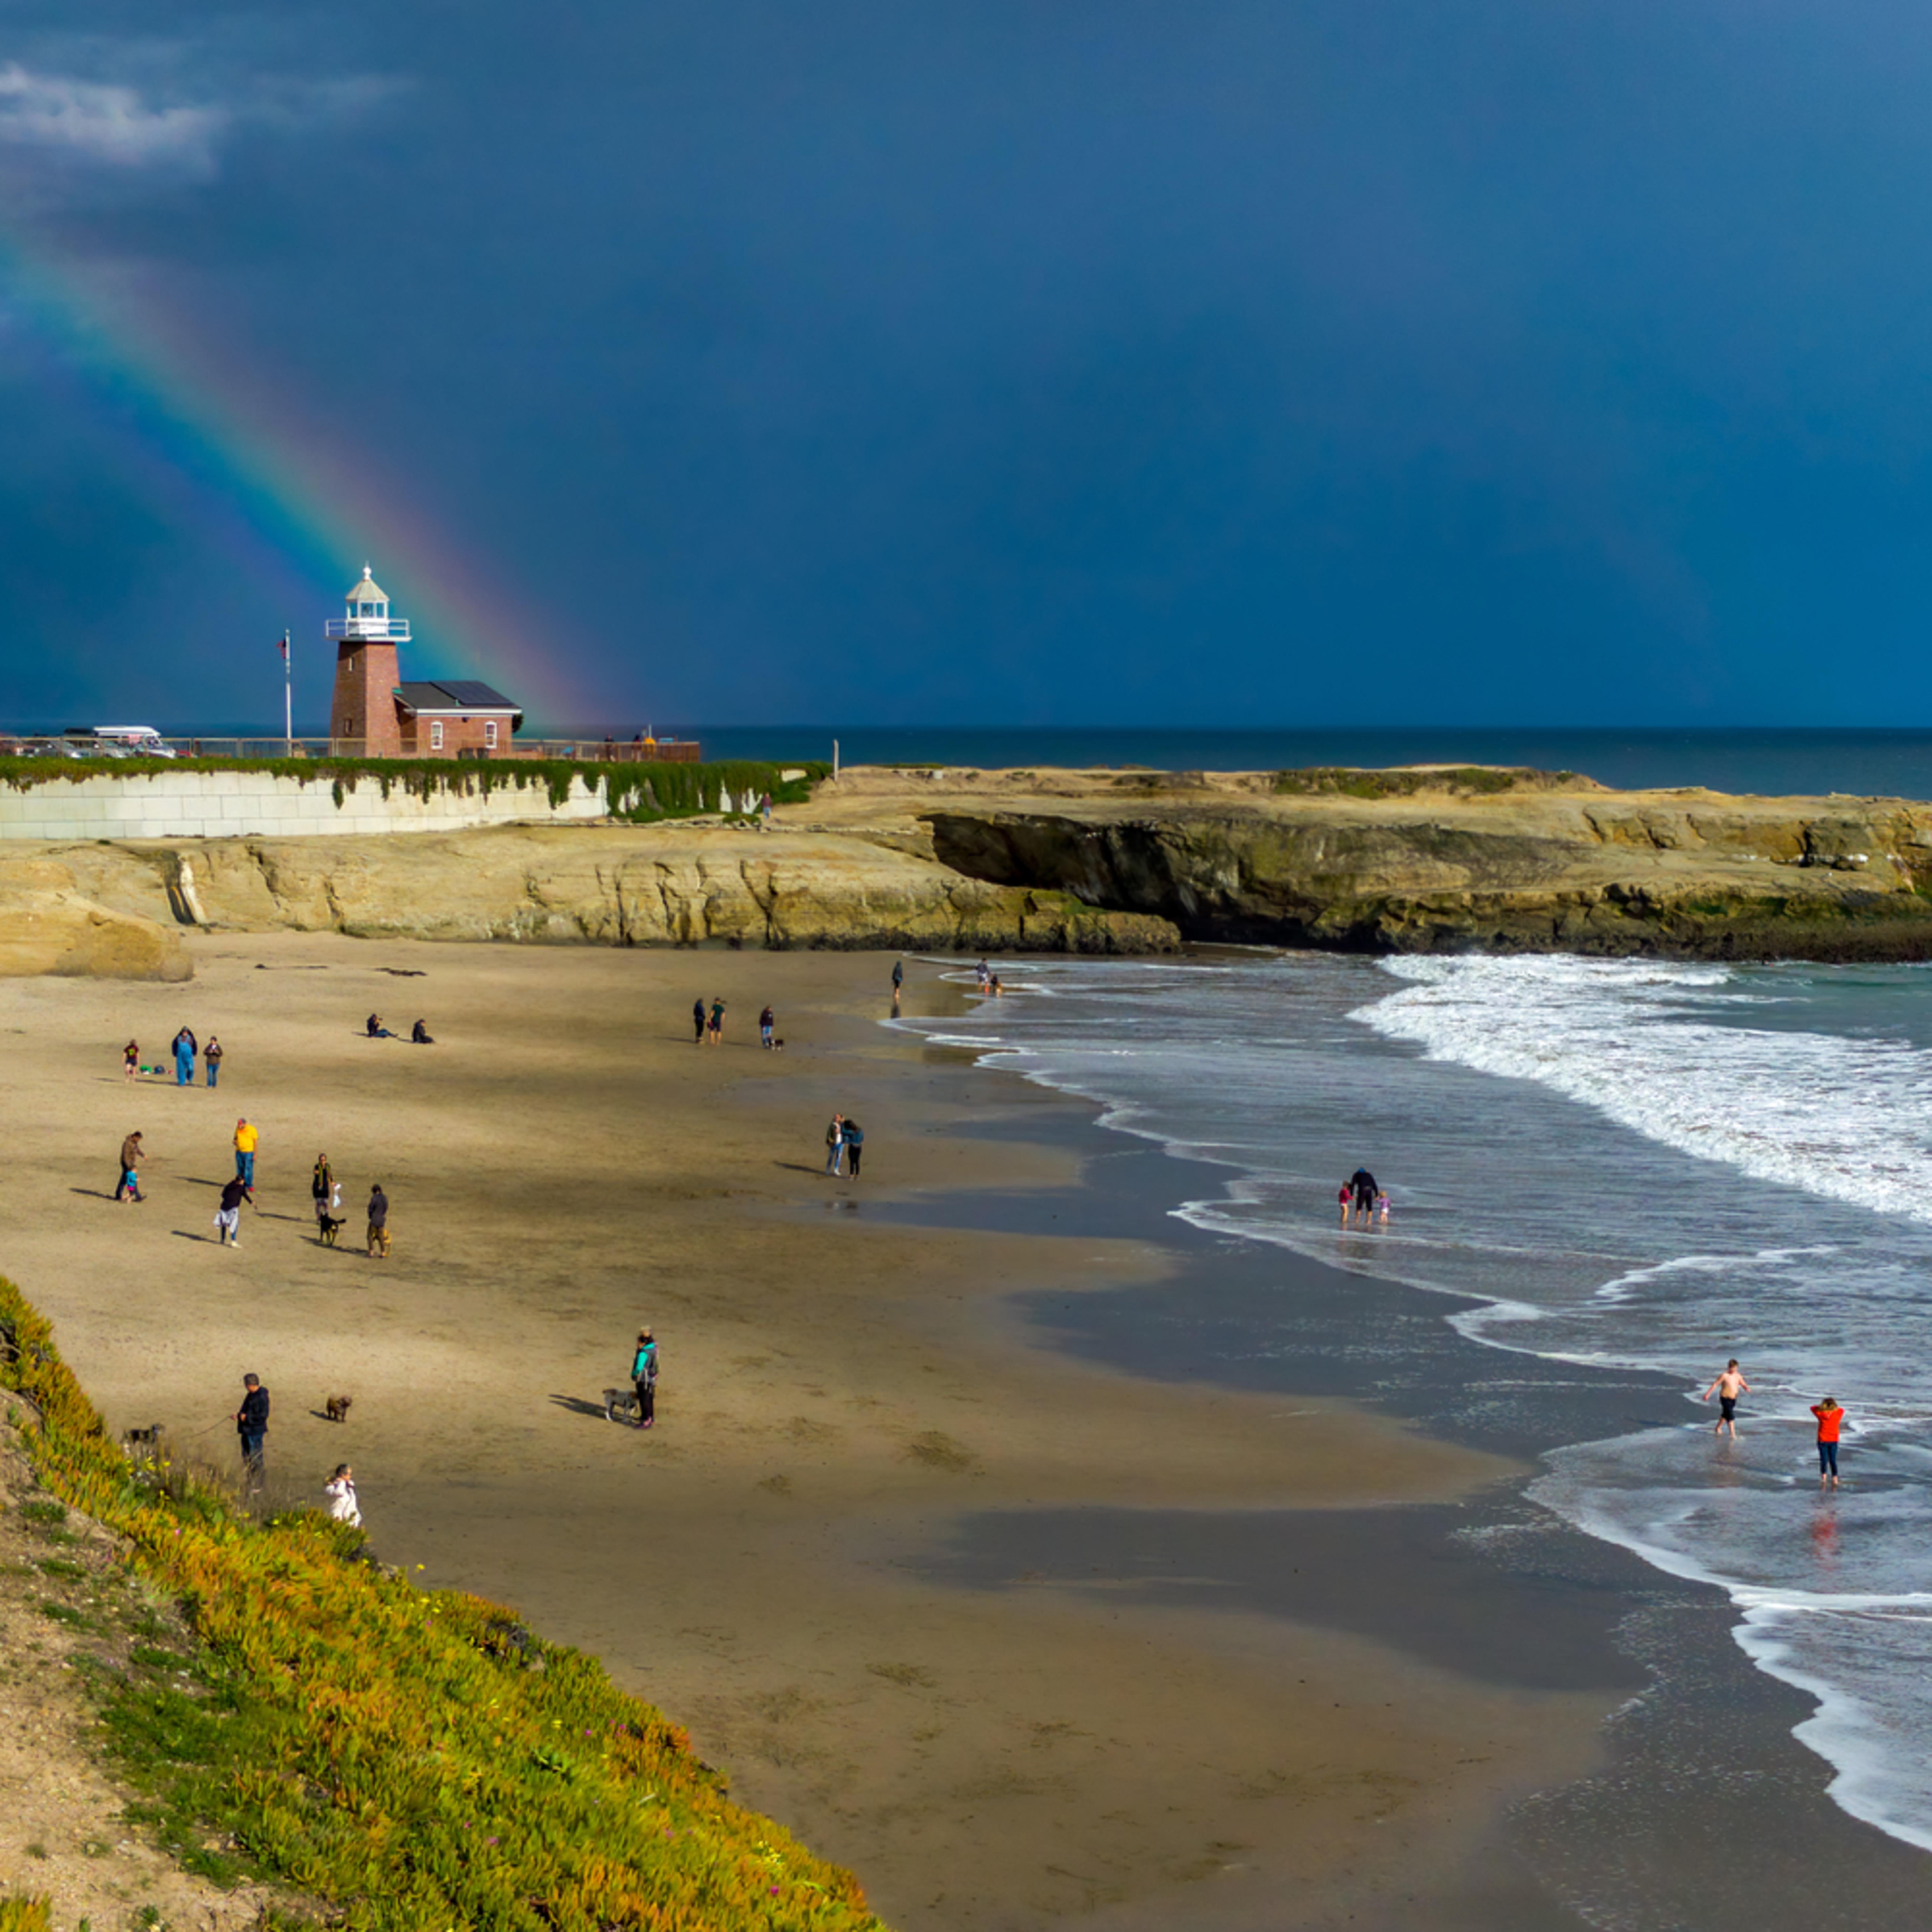 Santa cruz rainbow vvggkf